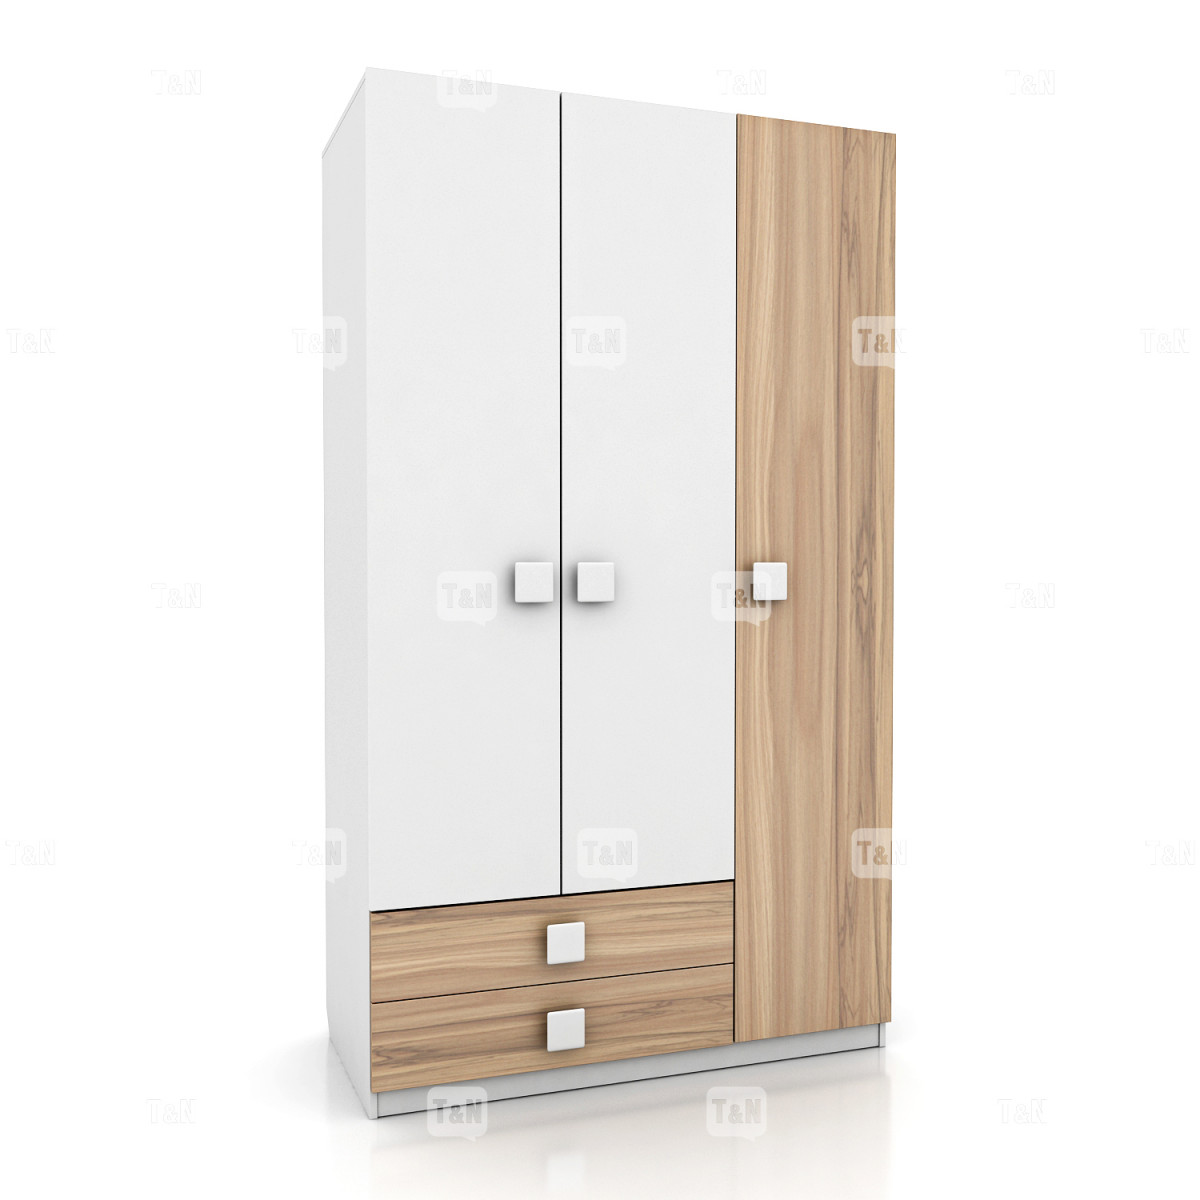 Шкаф 3-х дверный с двумя ящиками (Фабрика TOMY NIKI )